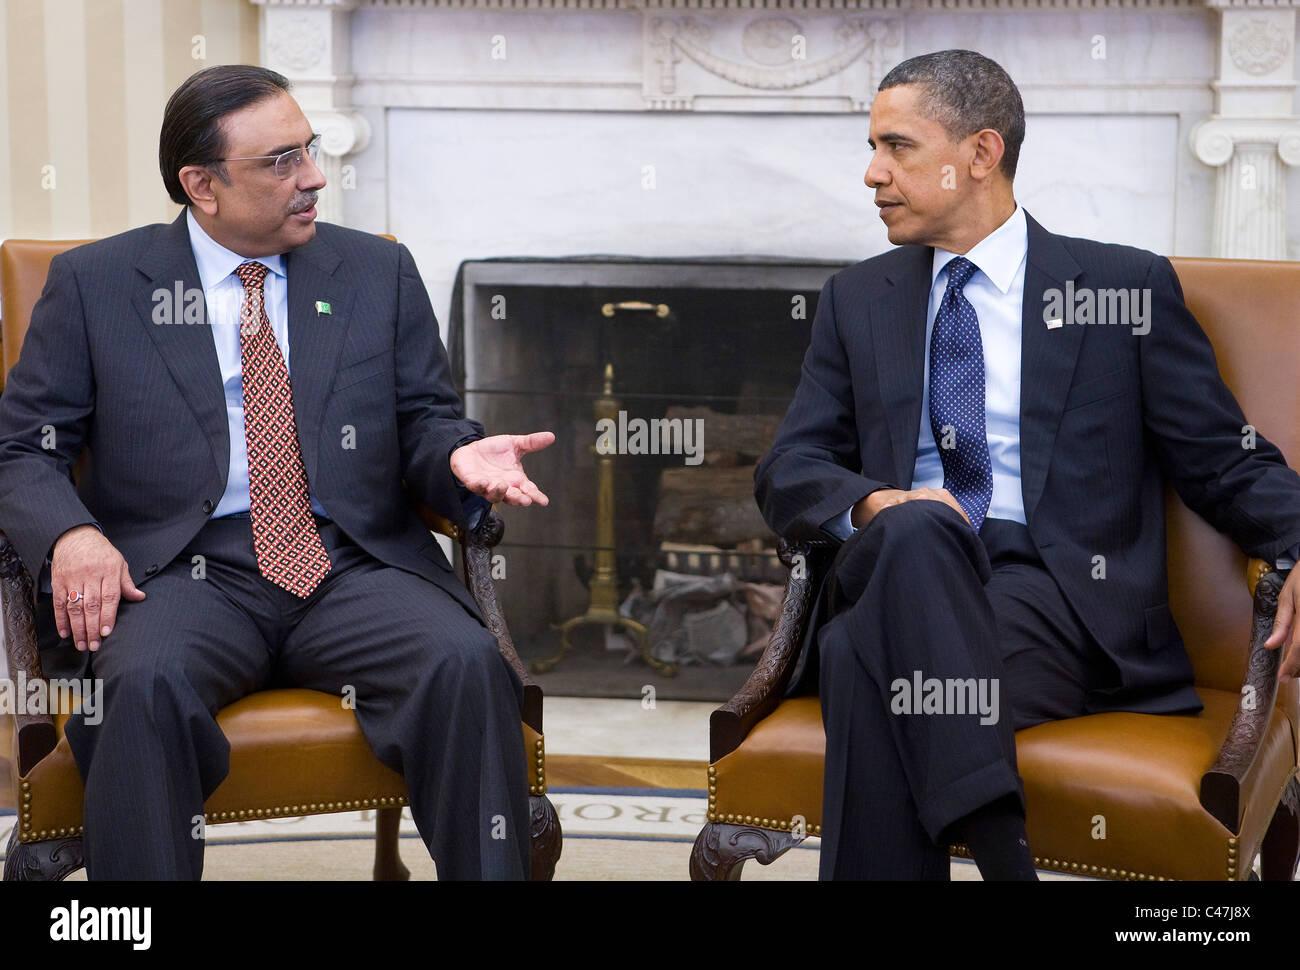 President Barack Obama meets with President Asif Ali Zardari of Pakistan. - Stock Image